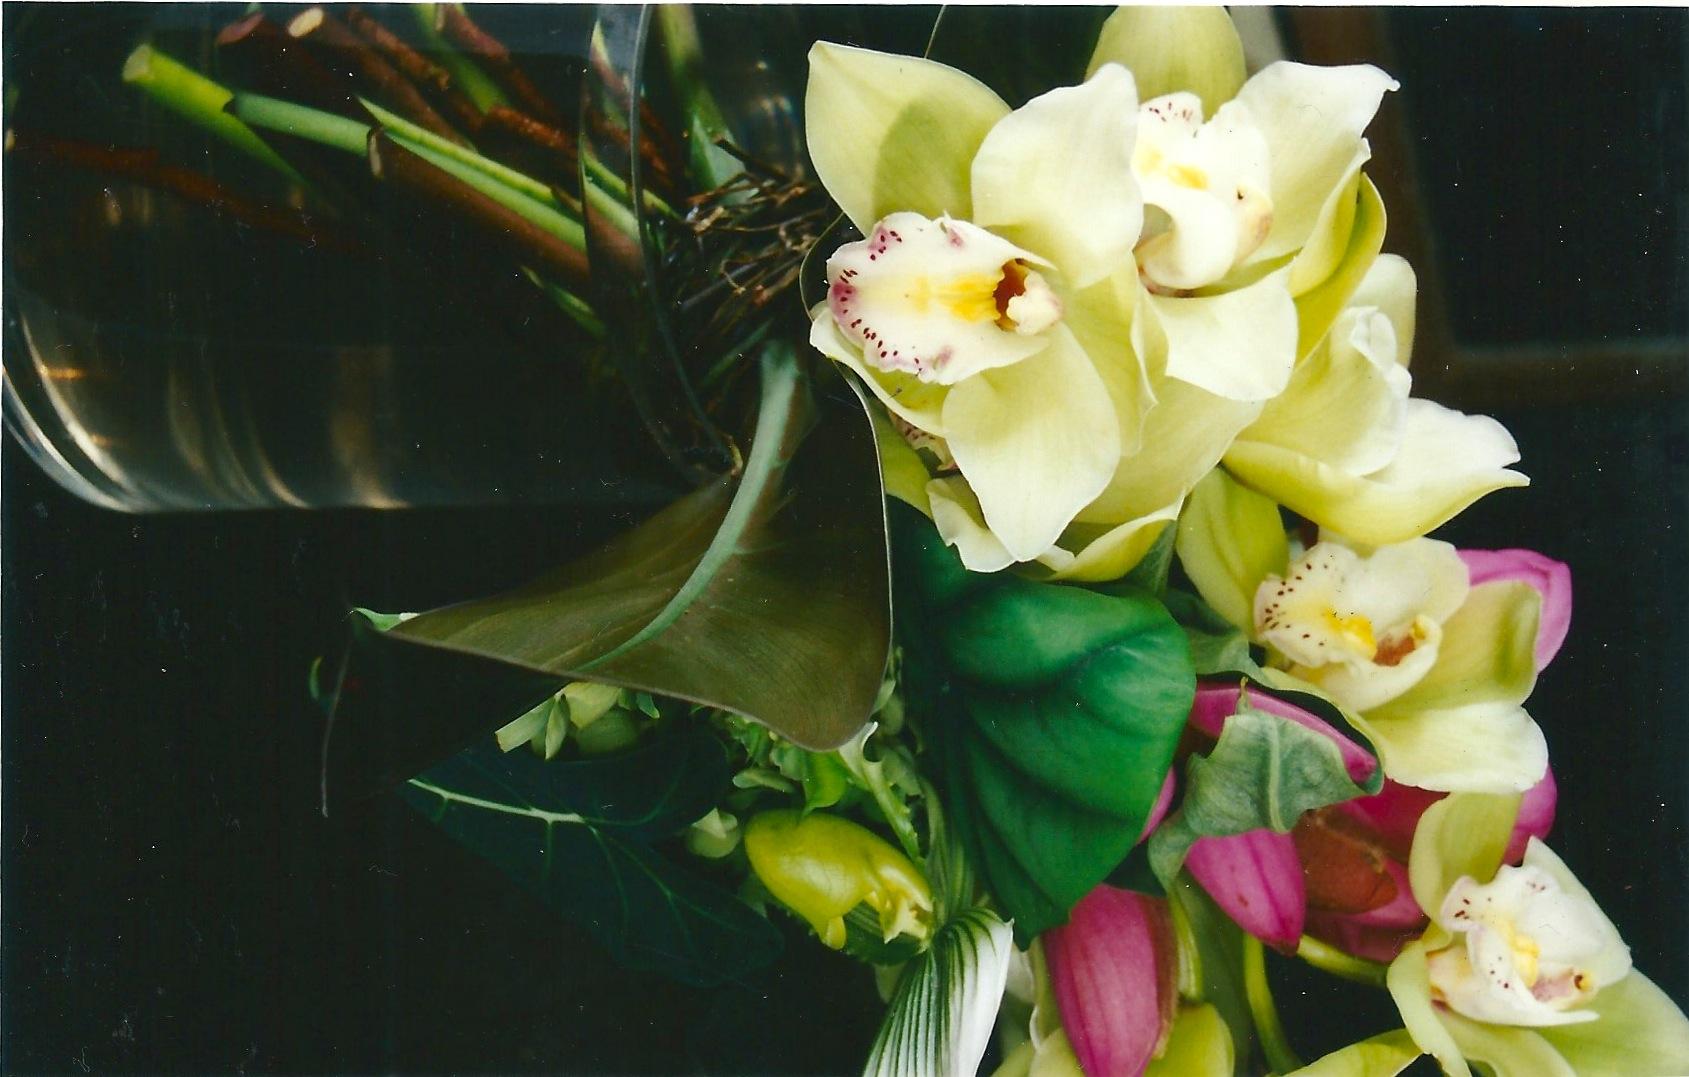 flower023.jpeg